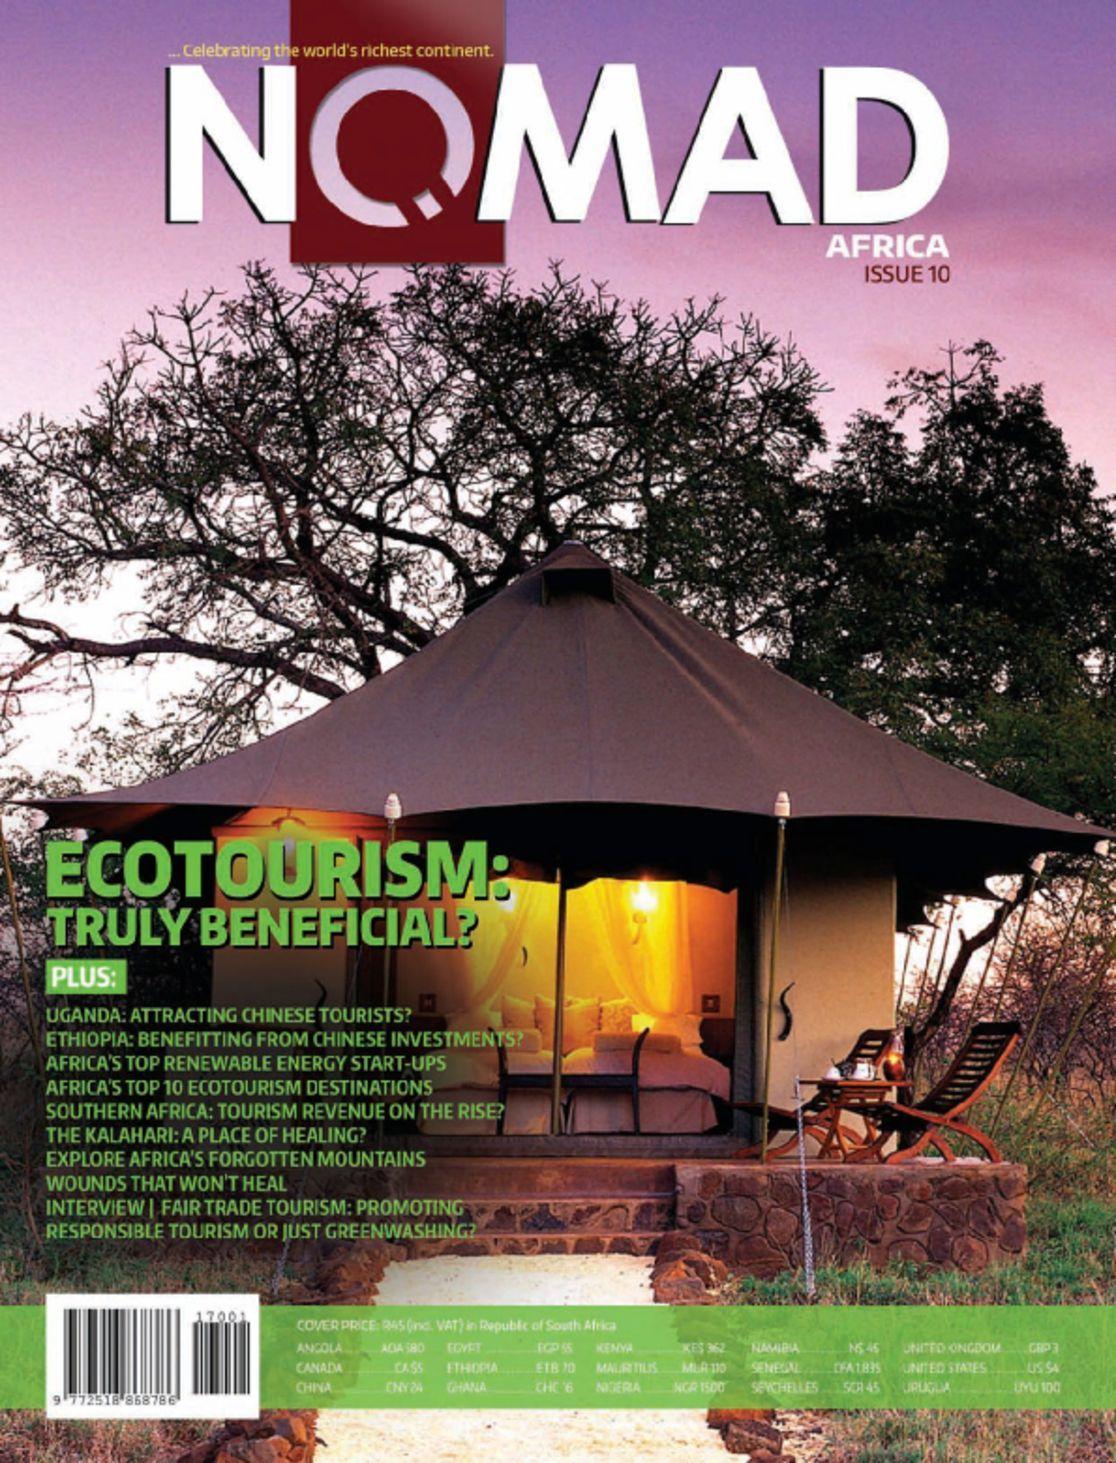 Nomad Africa Digital